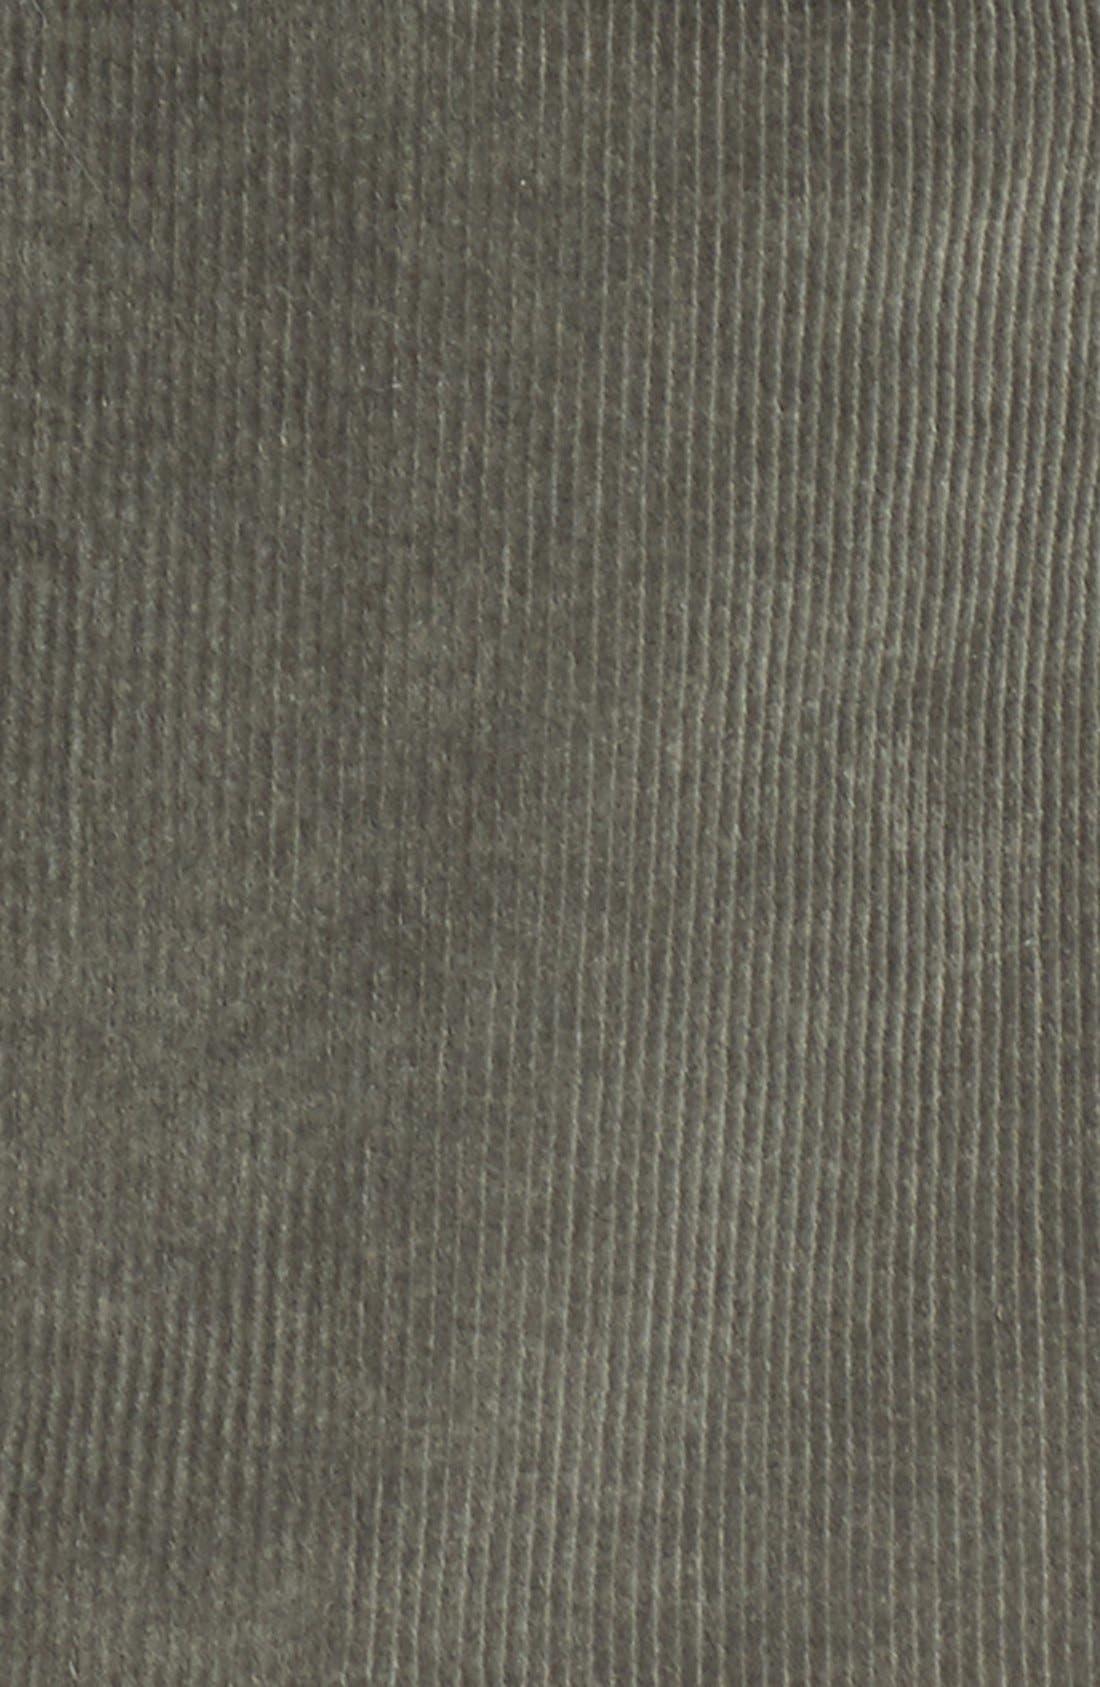 JOLT, Corduroy A-Line Skirt, Alternate thumbnail 3, color, 300